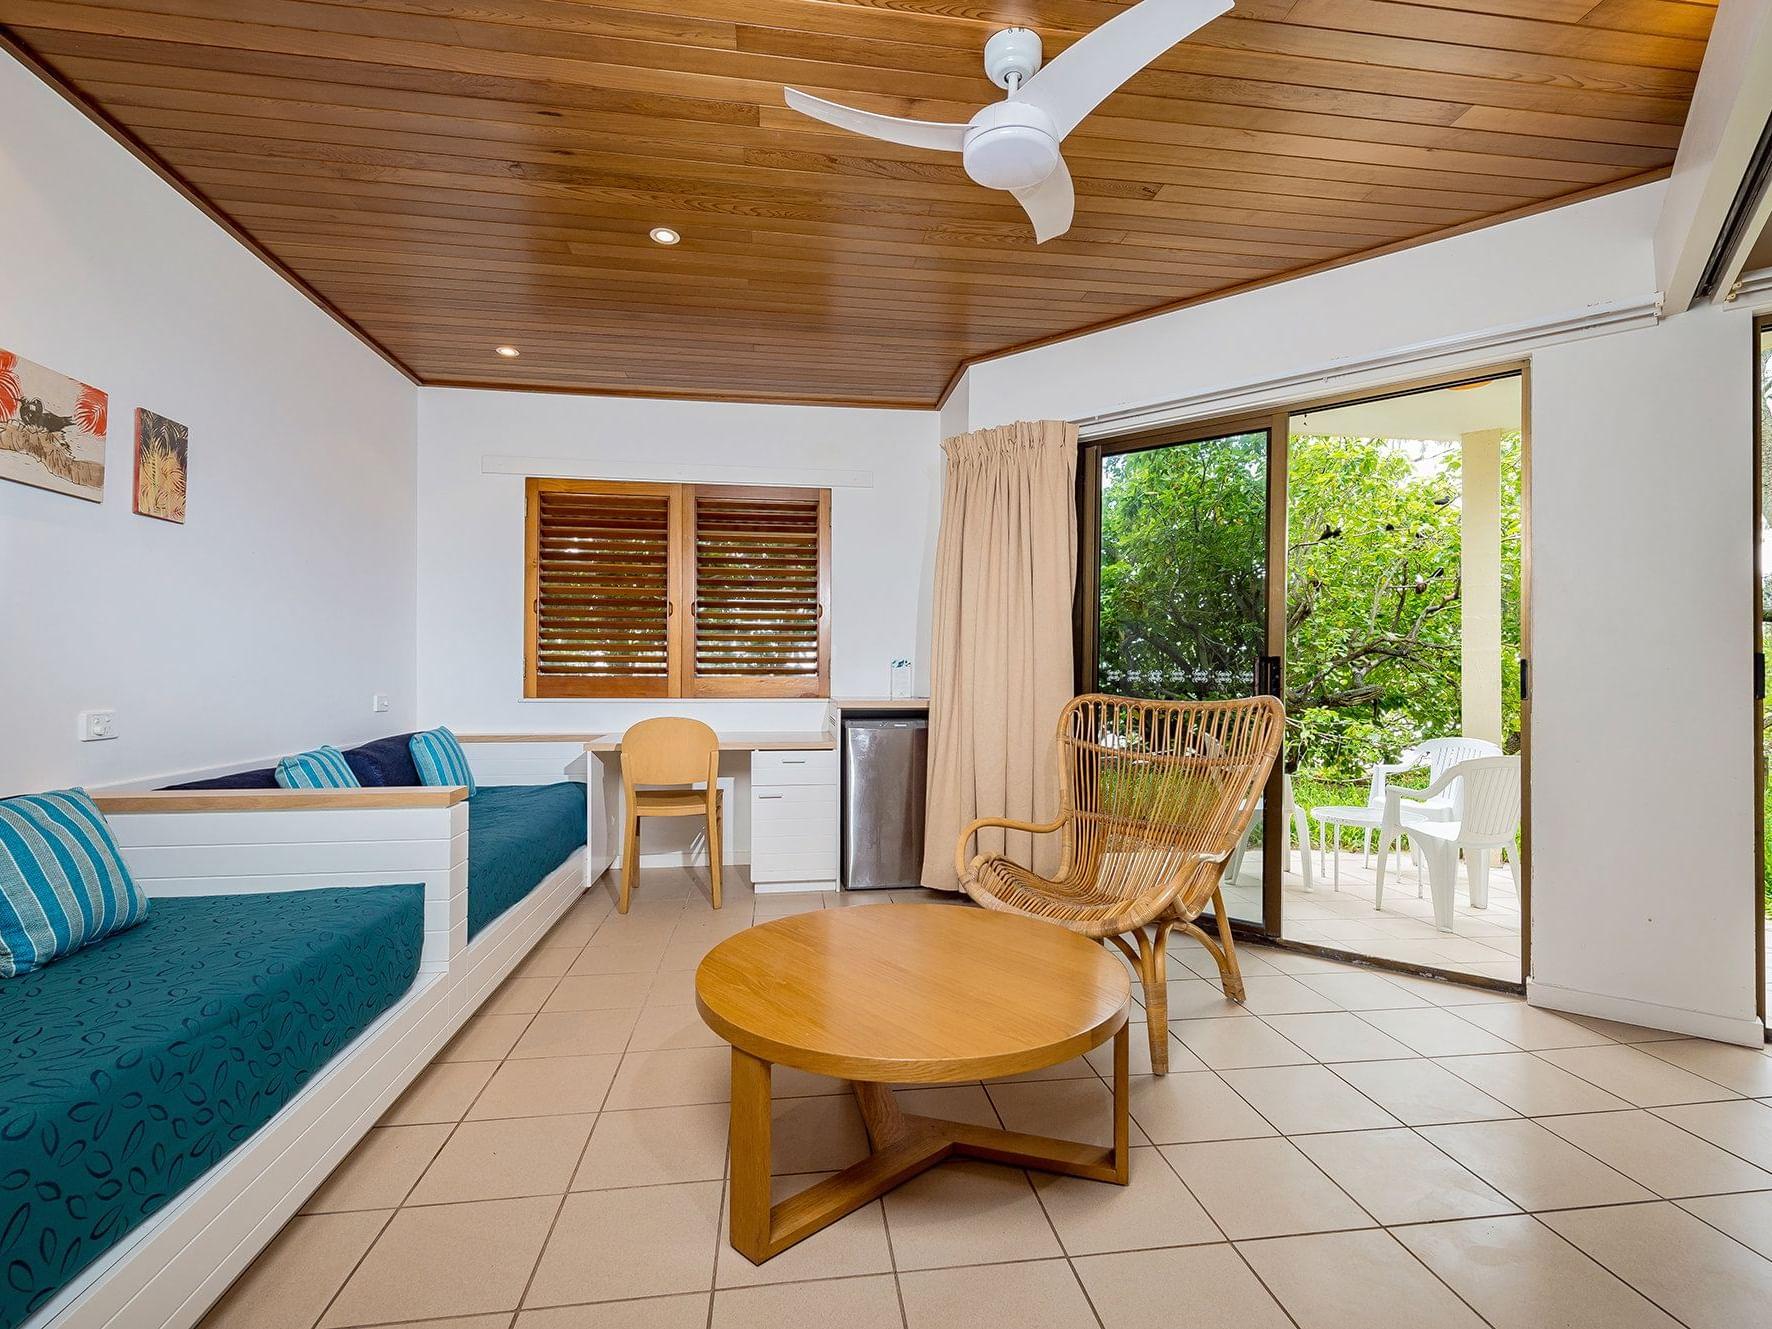 Beachside Room at Heron Island Resort in Queensland, Australia